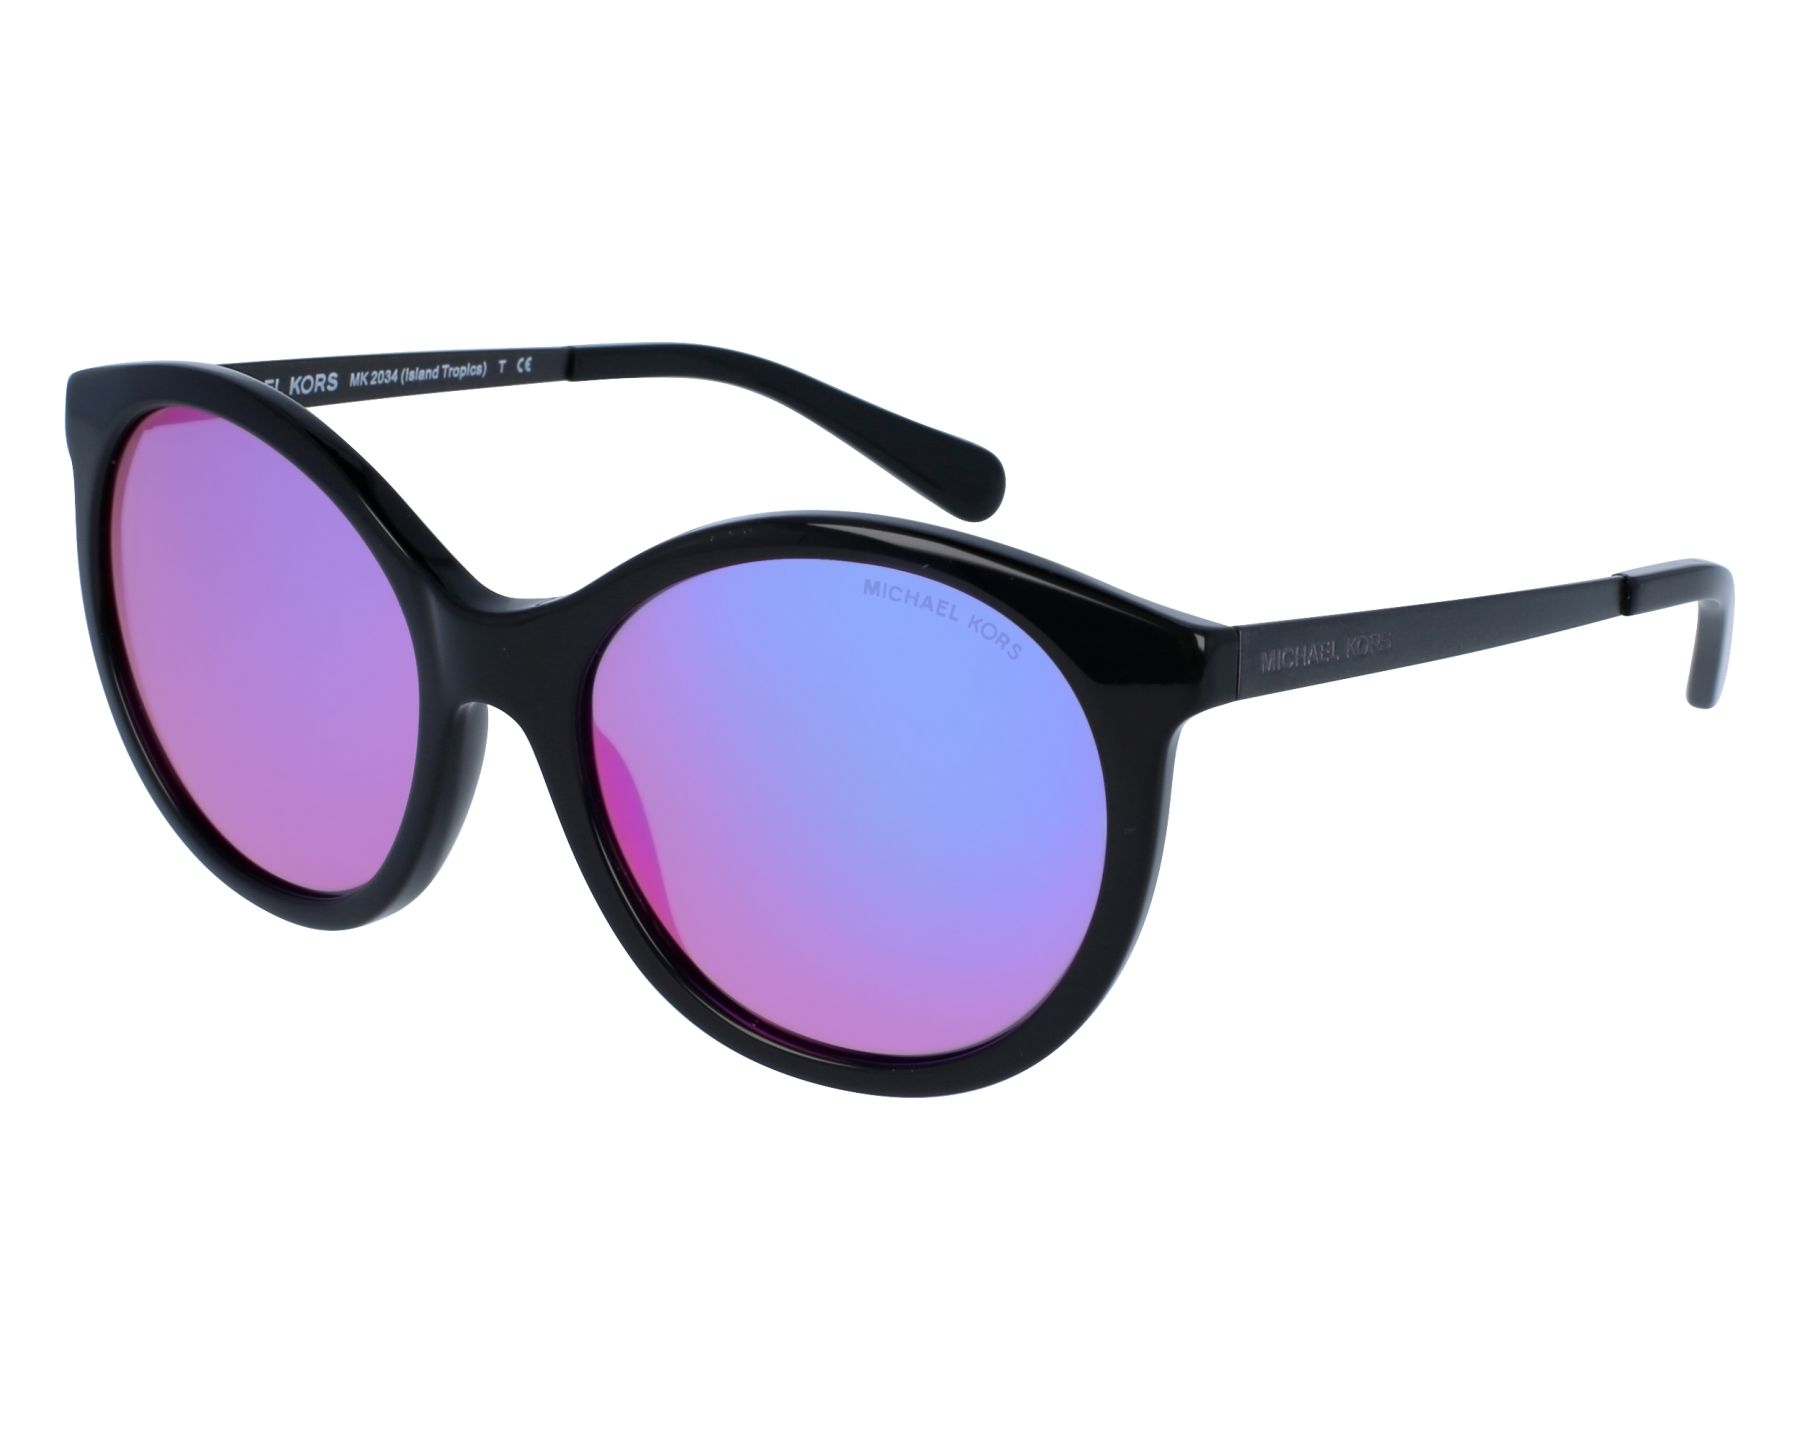 02fc895c5c Sunglasses Michael Kors MK-2034 32034X 55-18 Black Lila front view